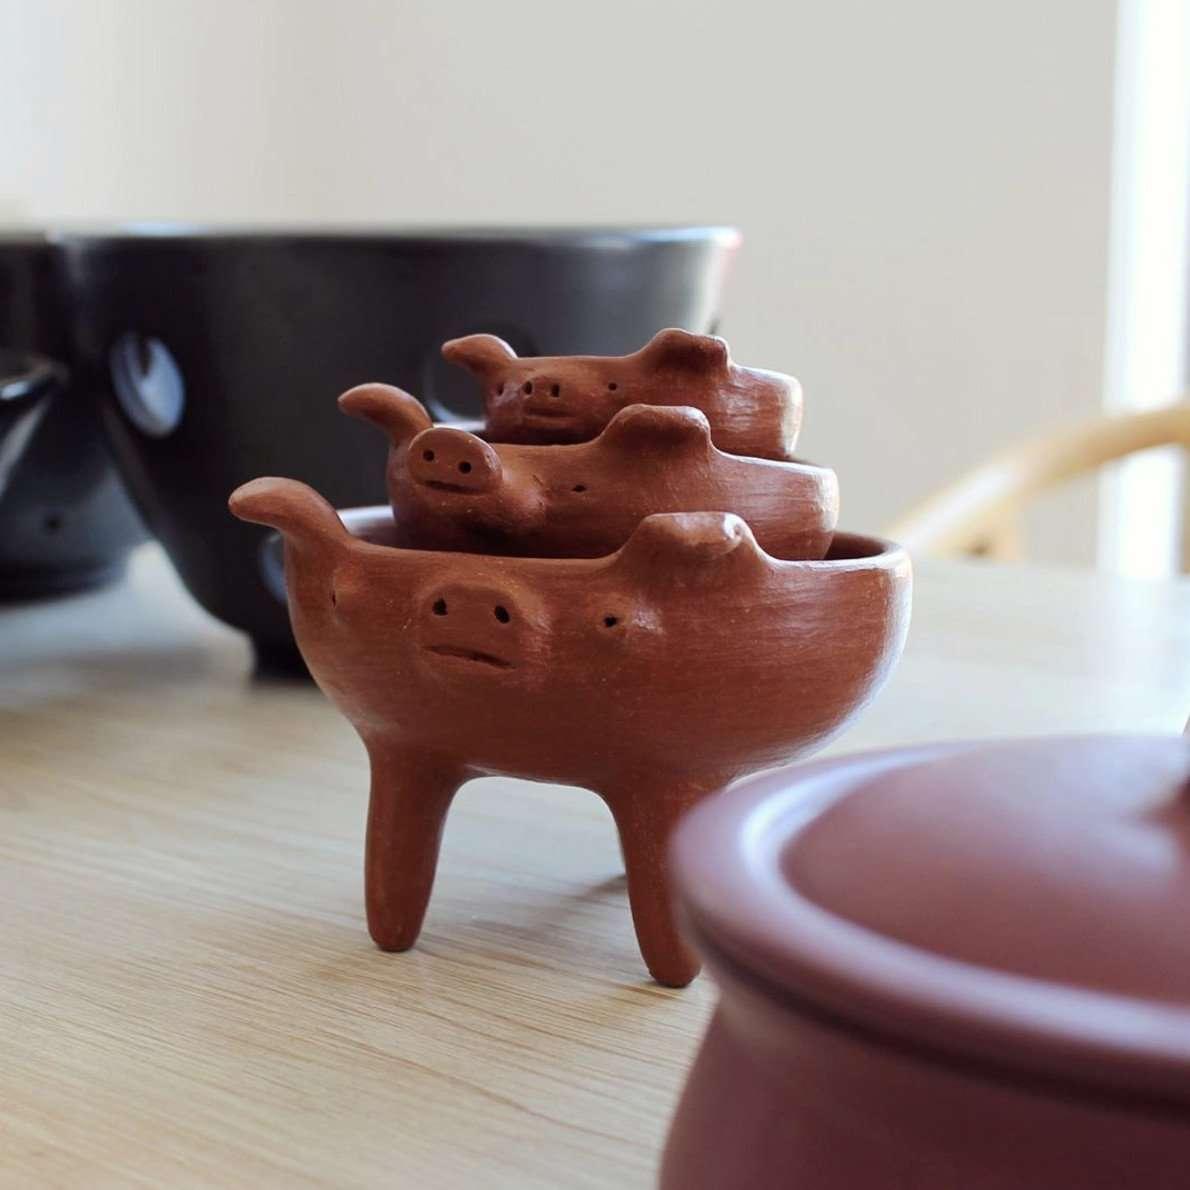 blog ropt colectivo 1050 pigs - indigenous